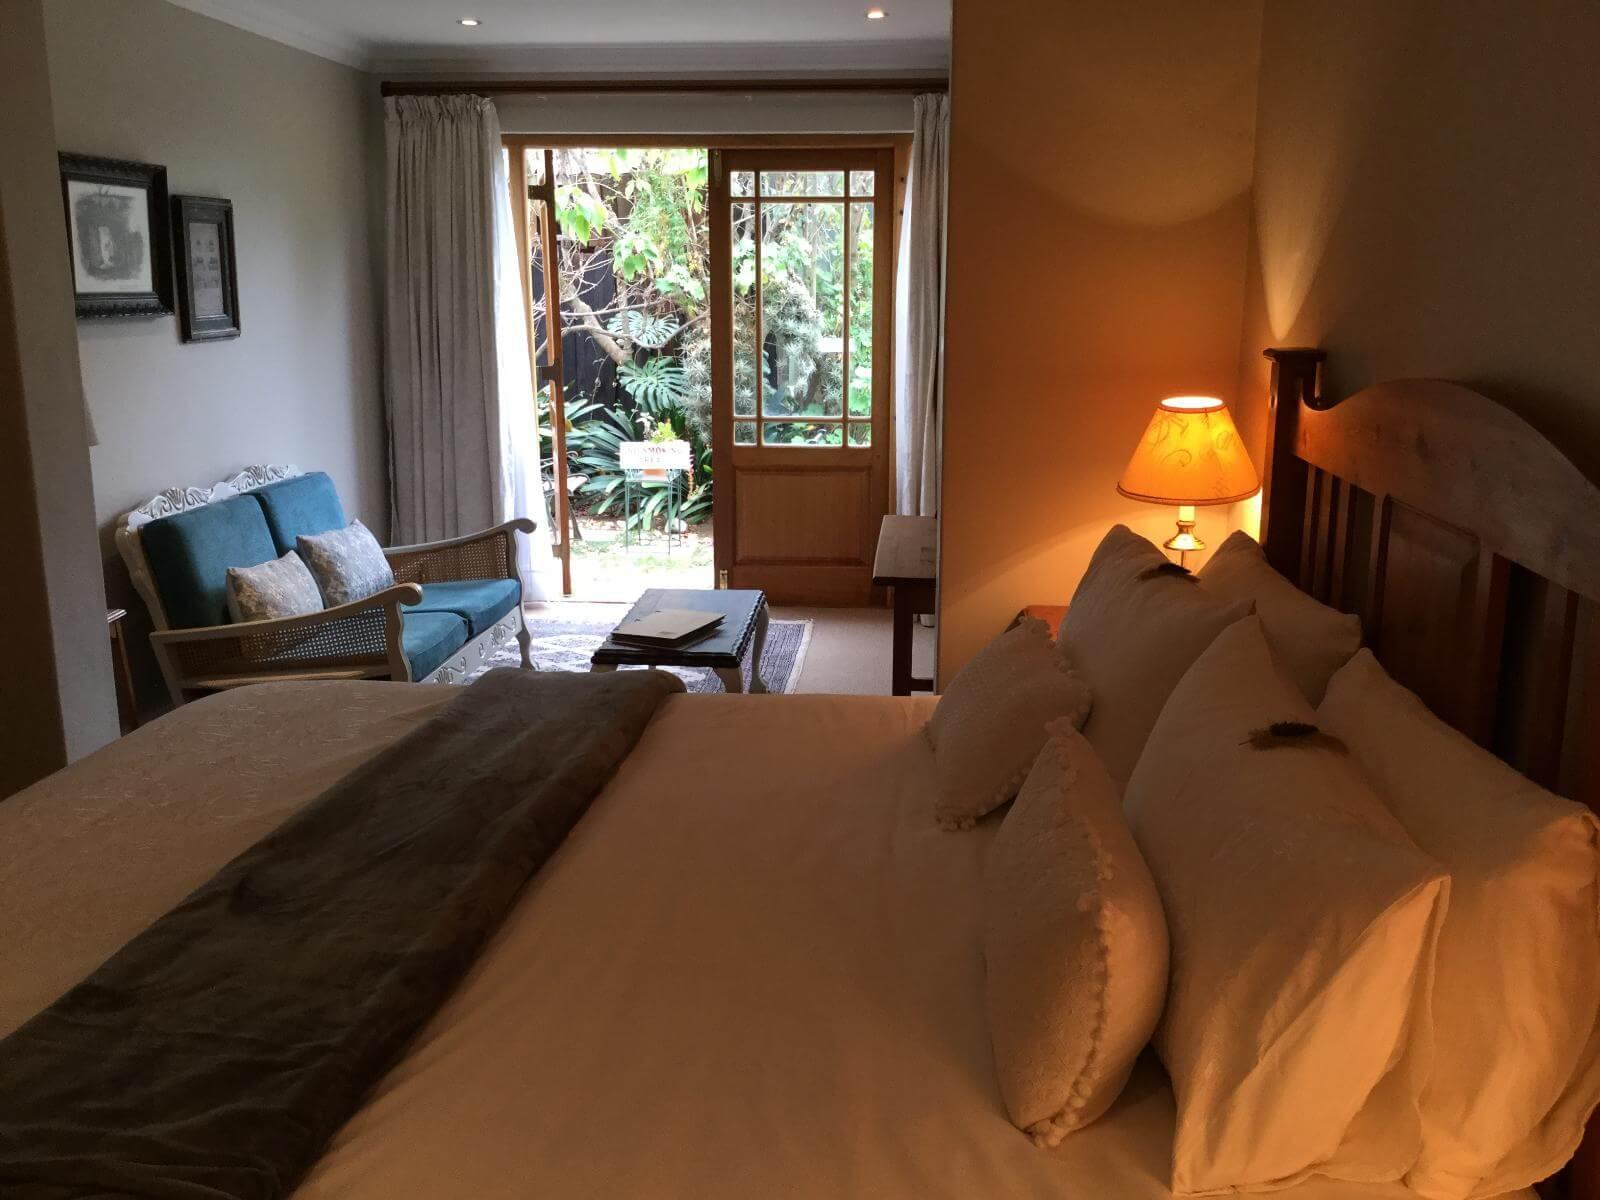 La Pension Guesthouse - Room 3 - King Room